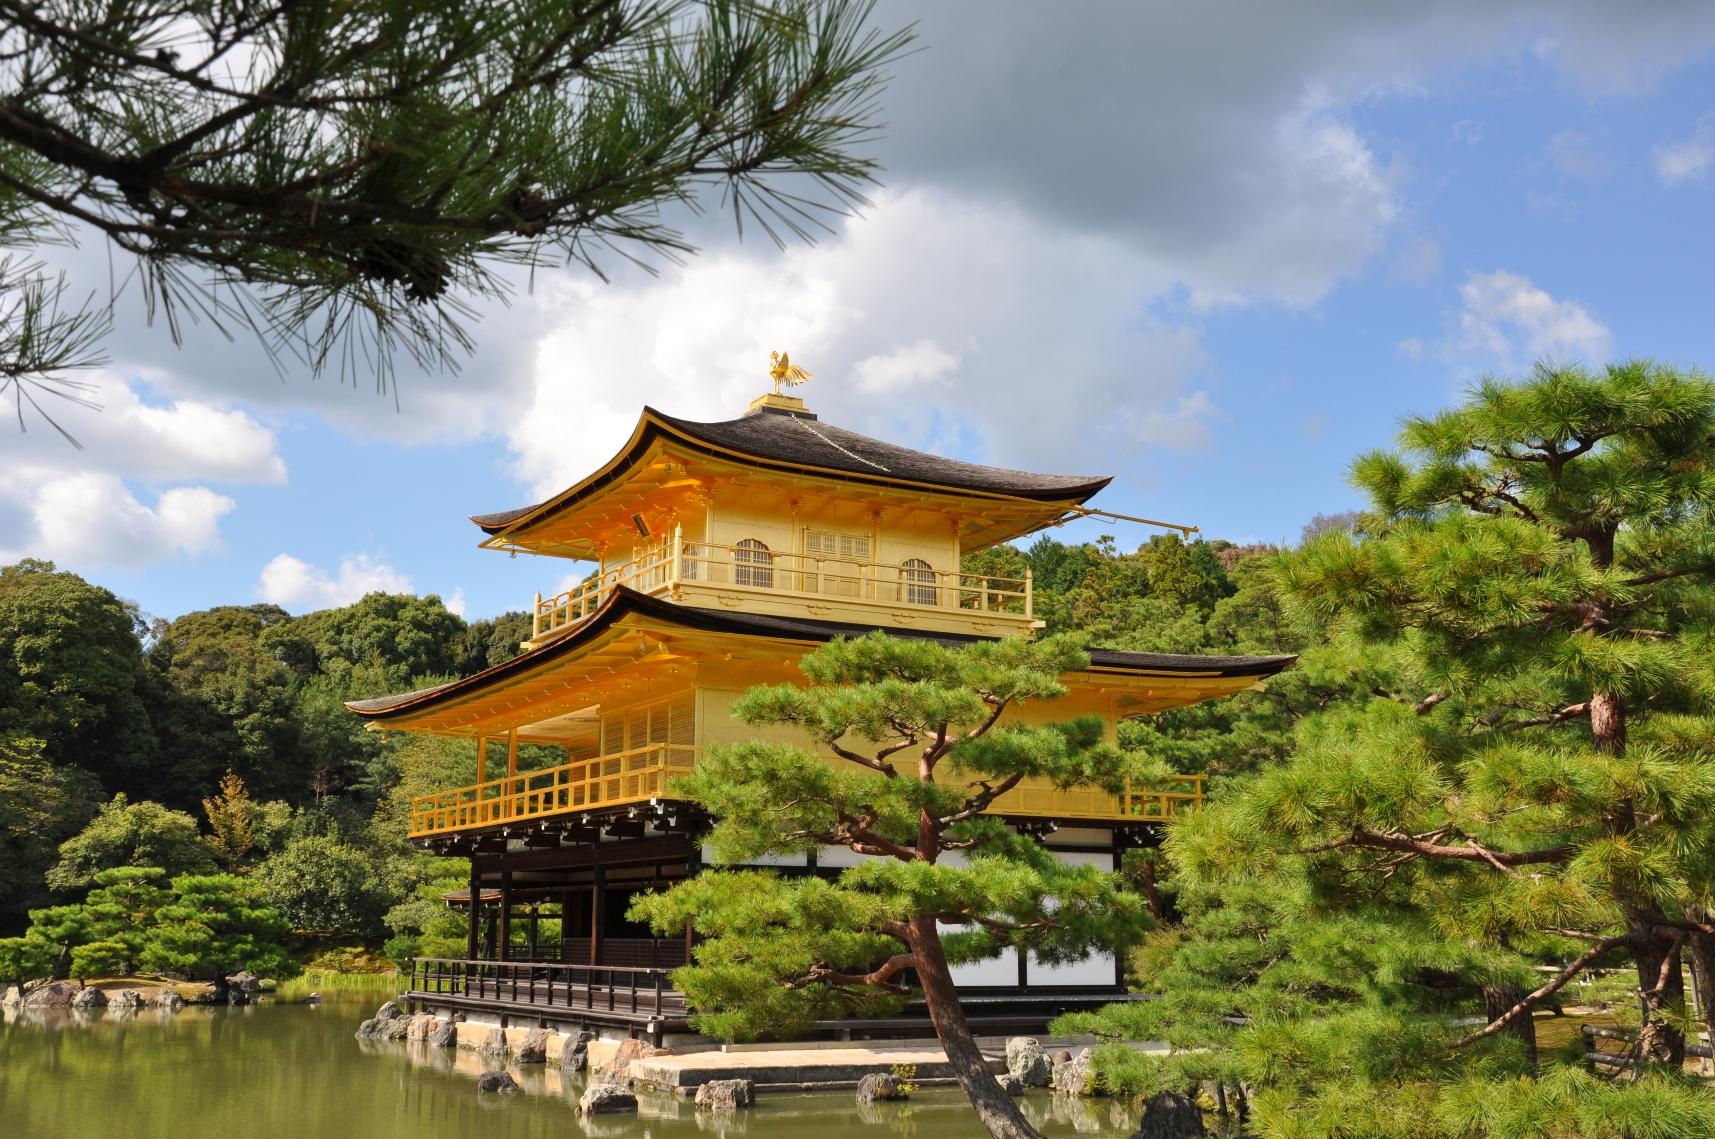 Tour Du Lịch Nhật Bản 5 Ngày 4 Đêm: Osaka - Kyoto - Fuji Moutain - Yokohama - Tokyo